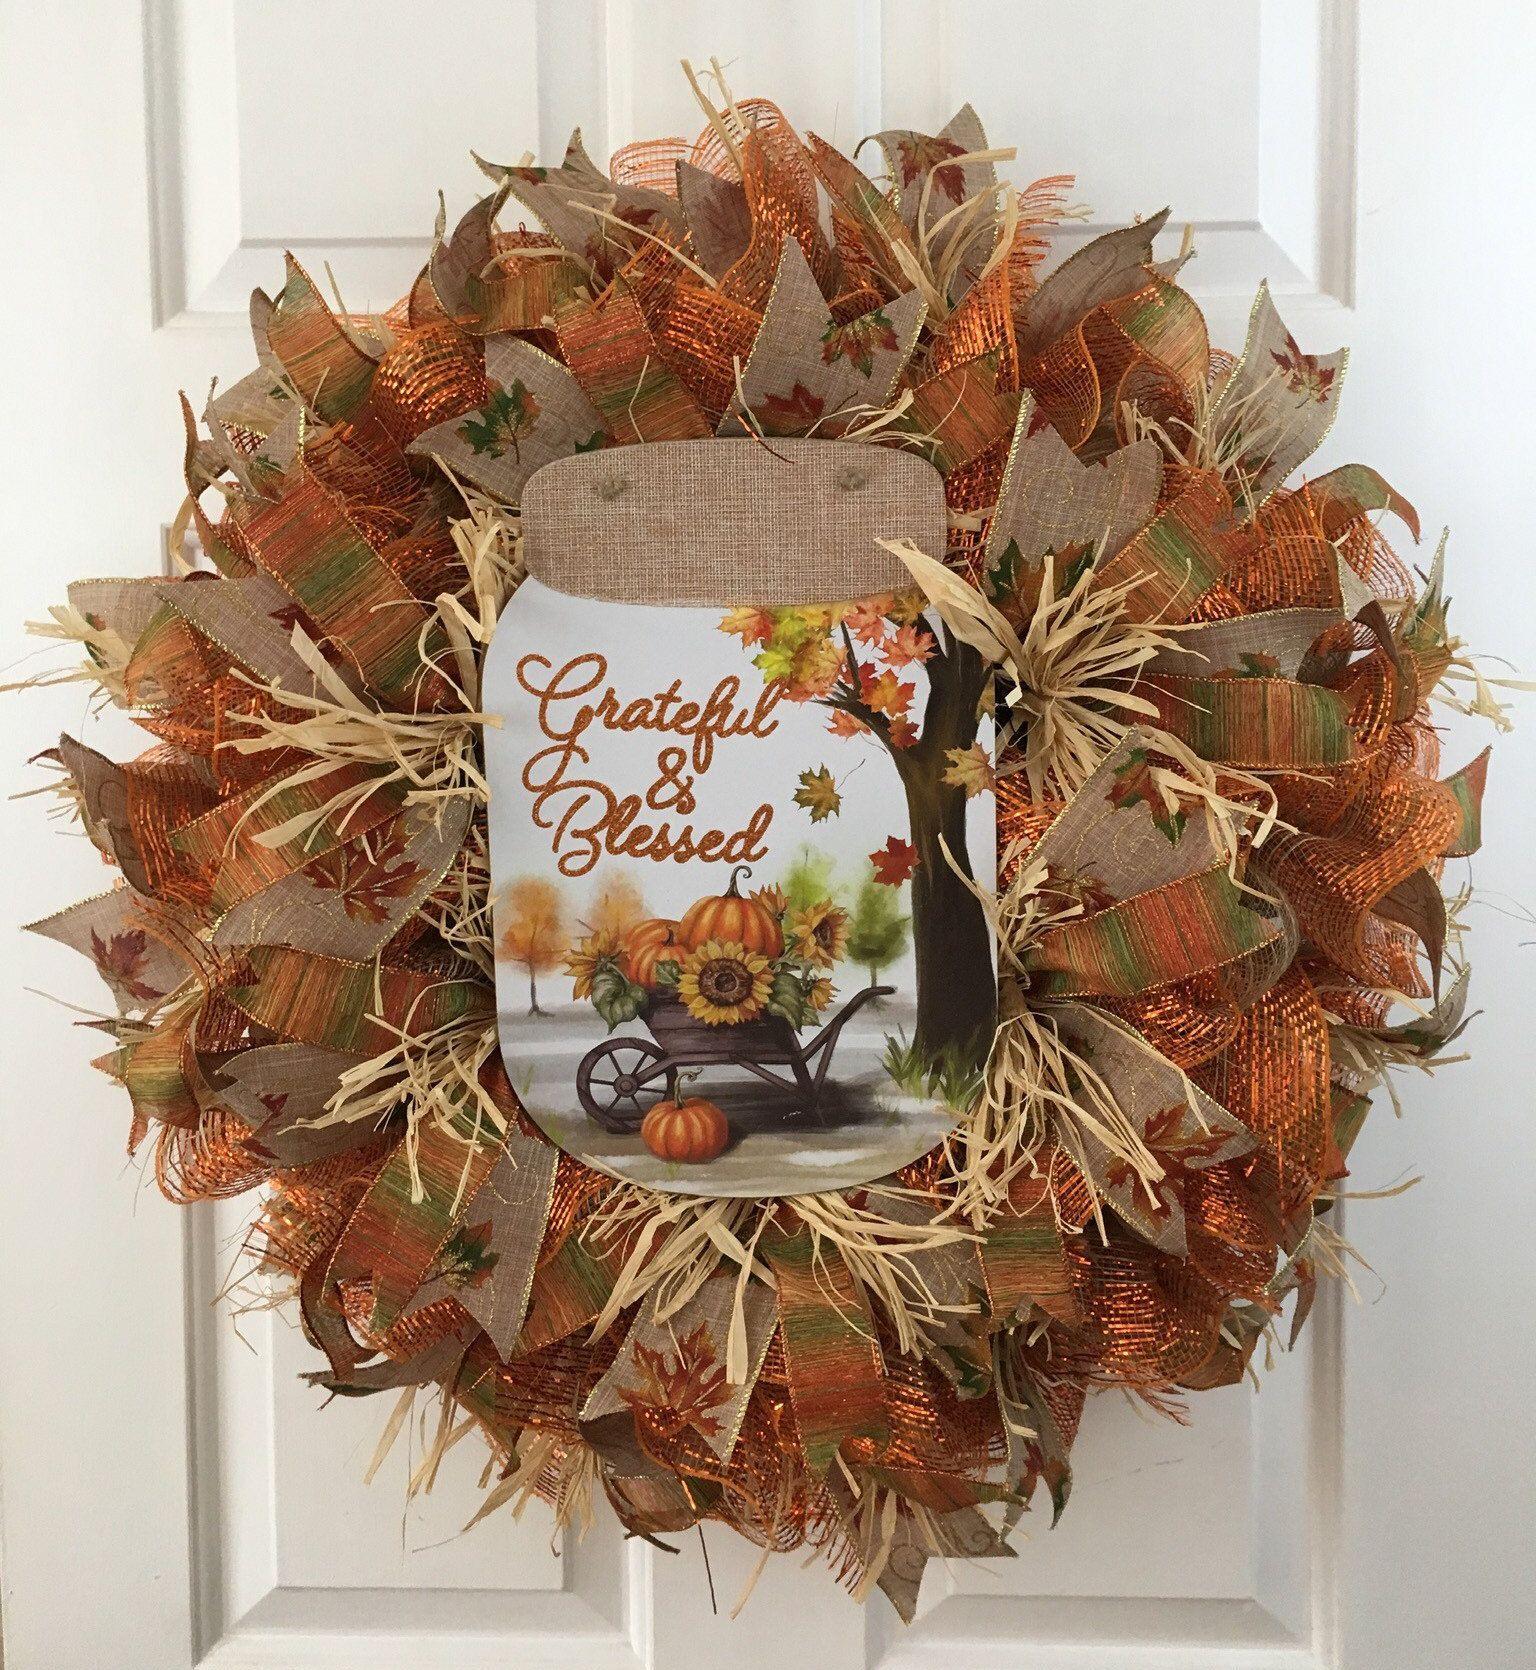 Photo of Fall Grateful and Blessed Wreath, Harvest Wreath, Autumn Wreath, Rustic Wreath, Farmhouse Wreath